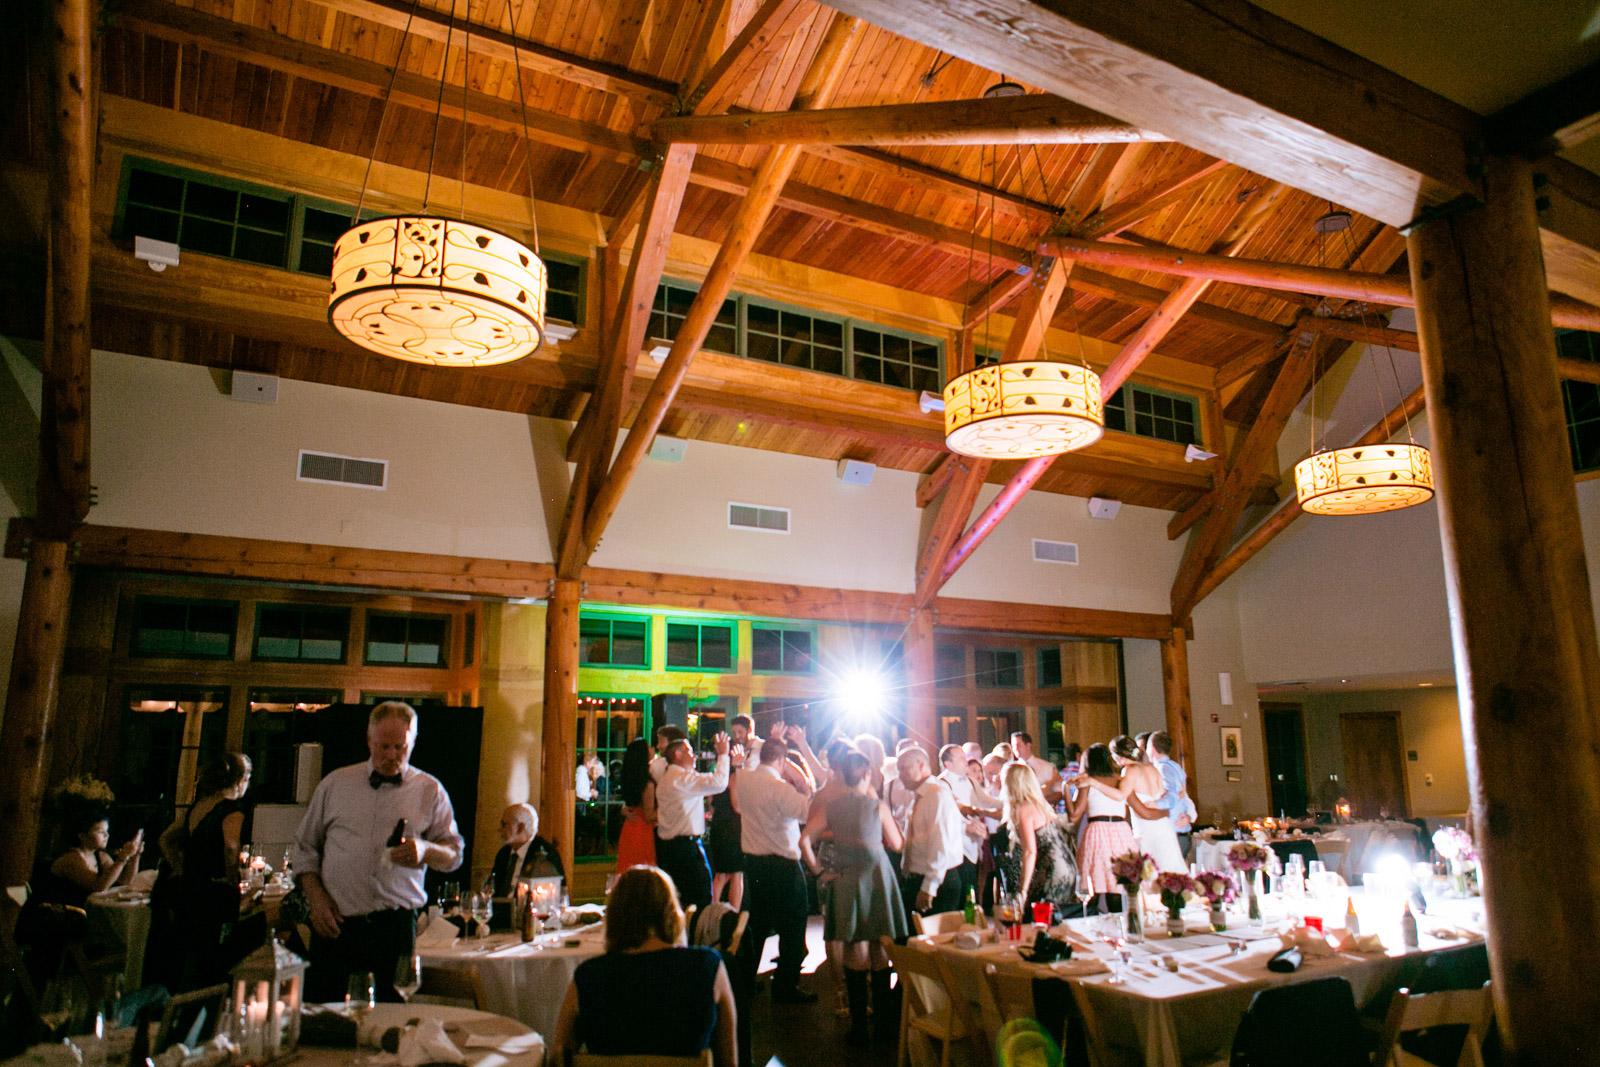 Inside the Dorris Duke Center at Duke Gardens in Durham North Carolina.  Guests dance on the dance floor after a good meal